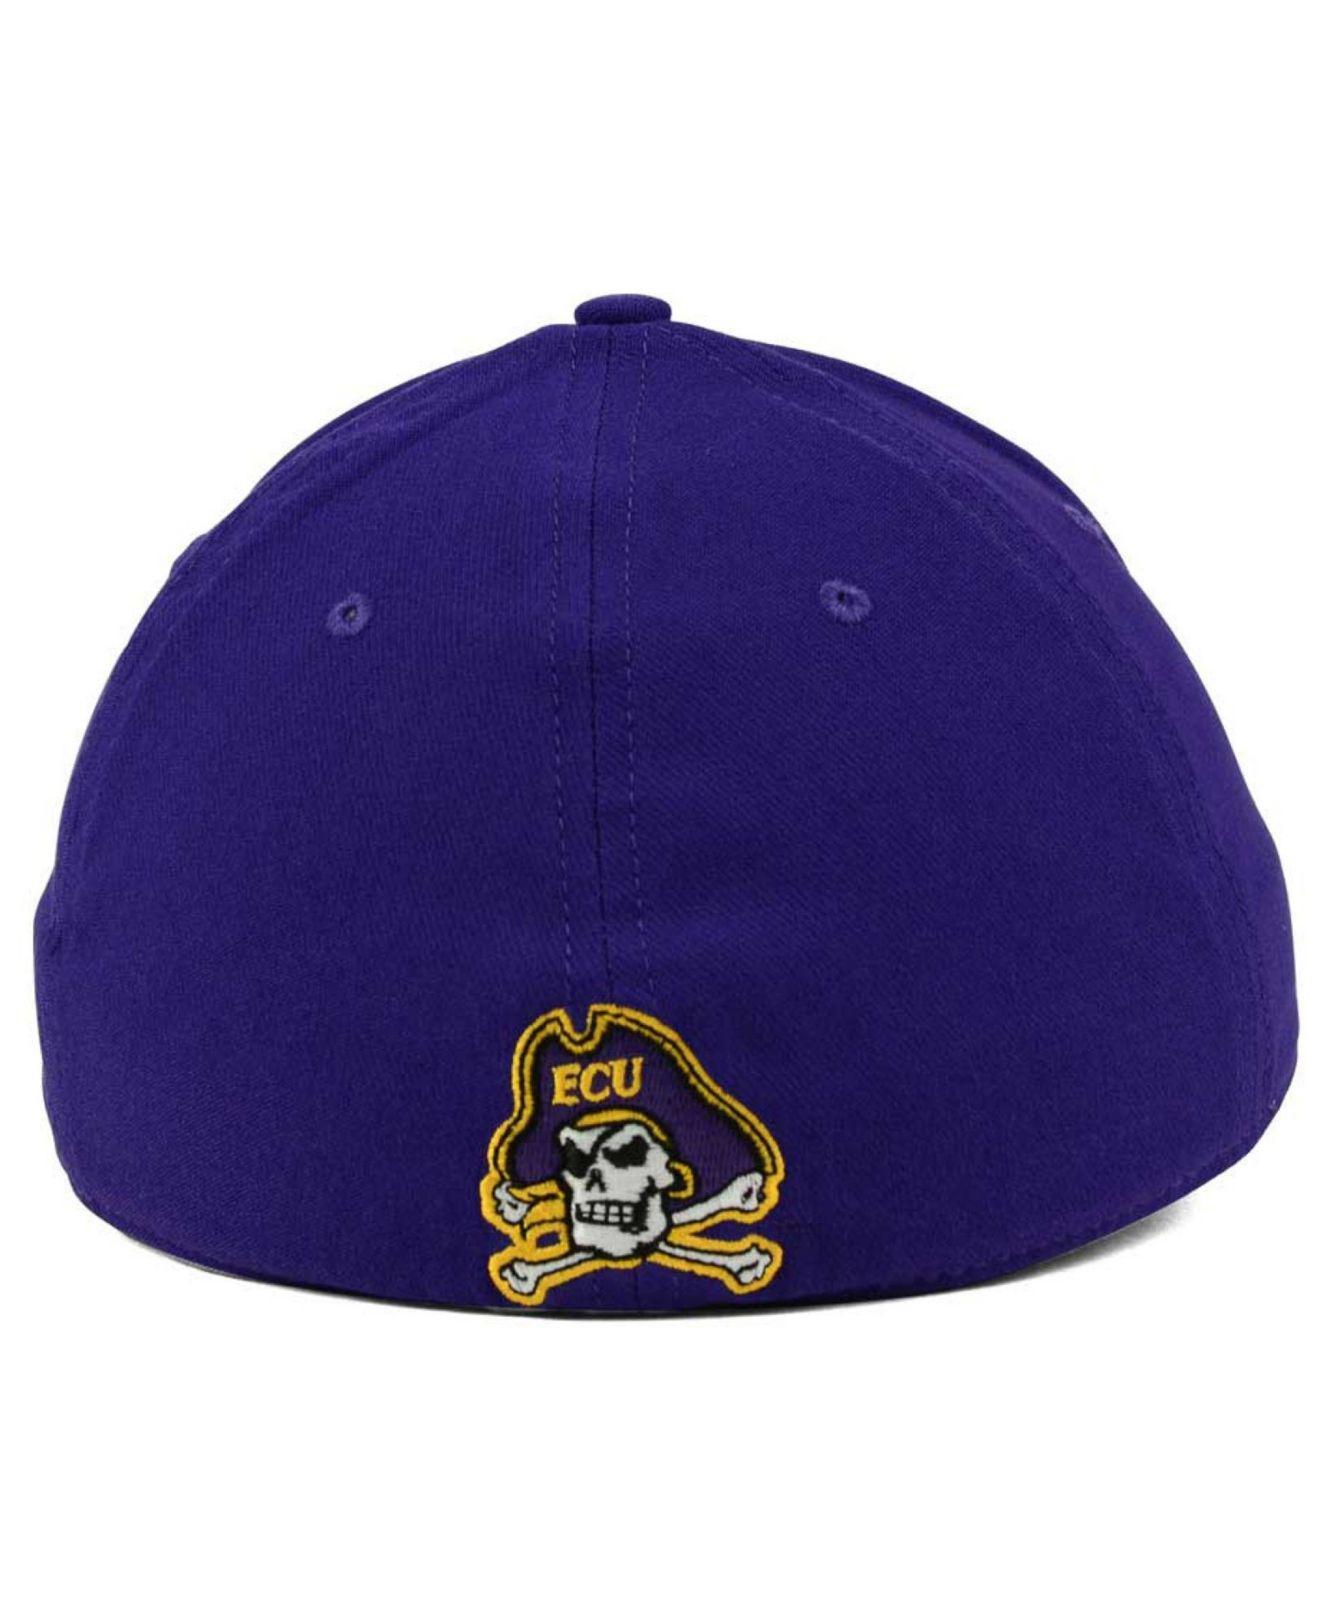 f8484d95767 ... promo code for lyst nike east carolina pirates classic swoosh cap in  blue for men 97625